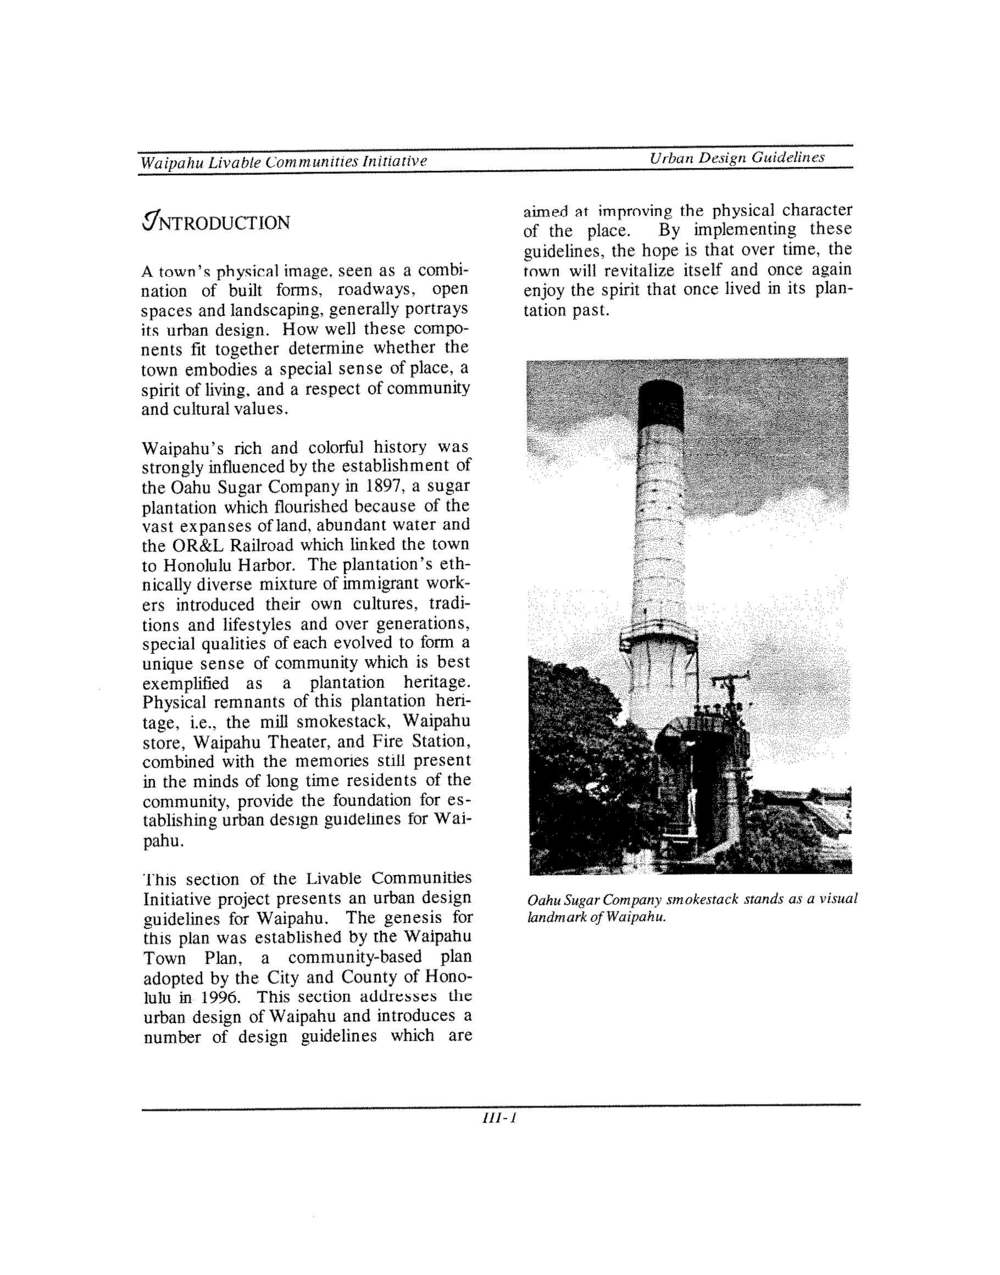 160531_WaipahuLivableCommunities(1998)_Page_091.jpg